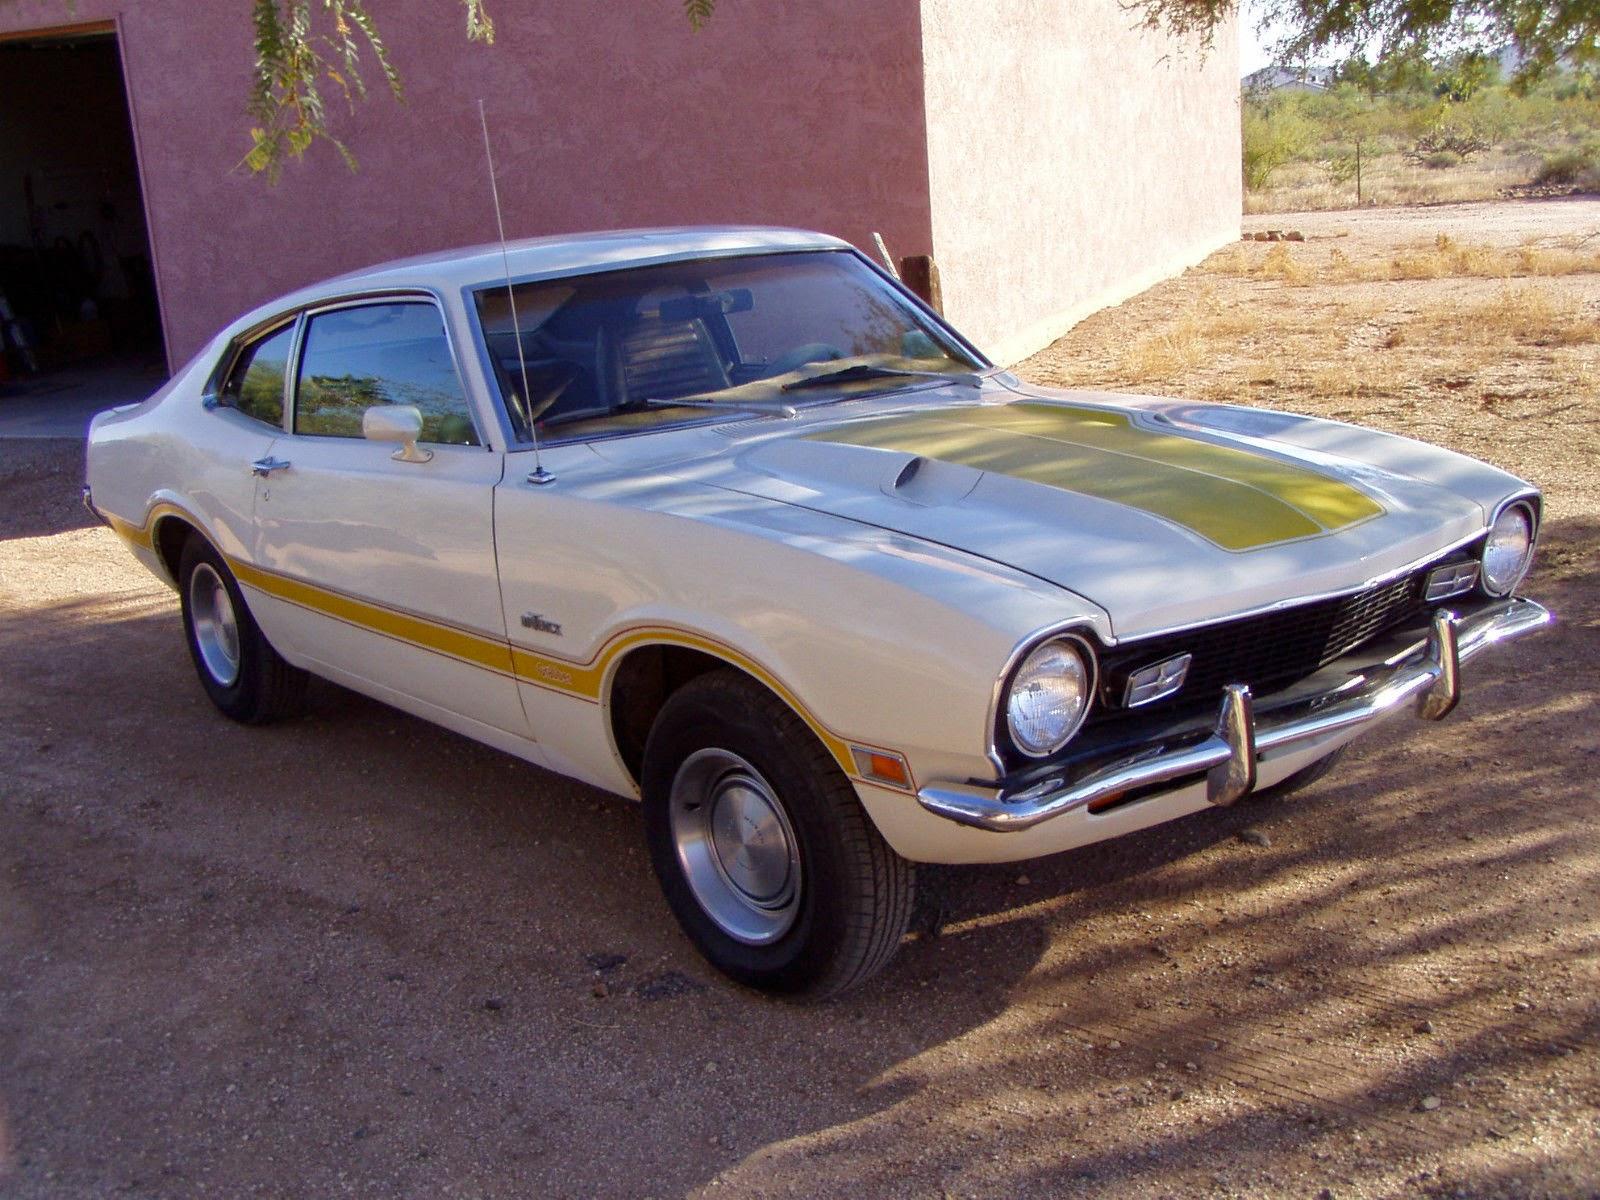 Daily turismo 5k grabber option 1972 ford maverick